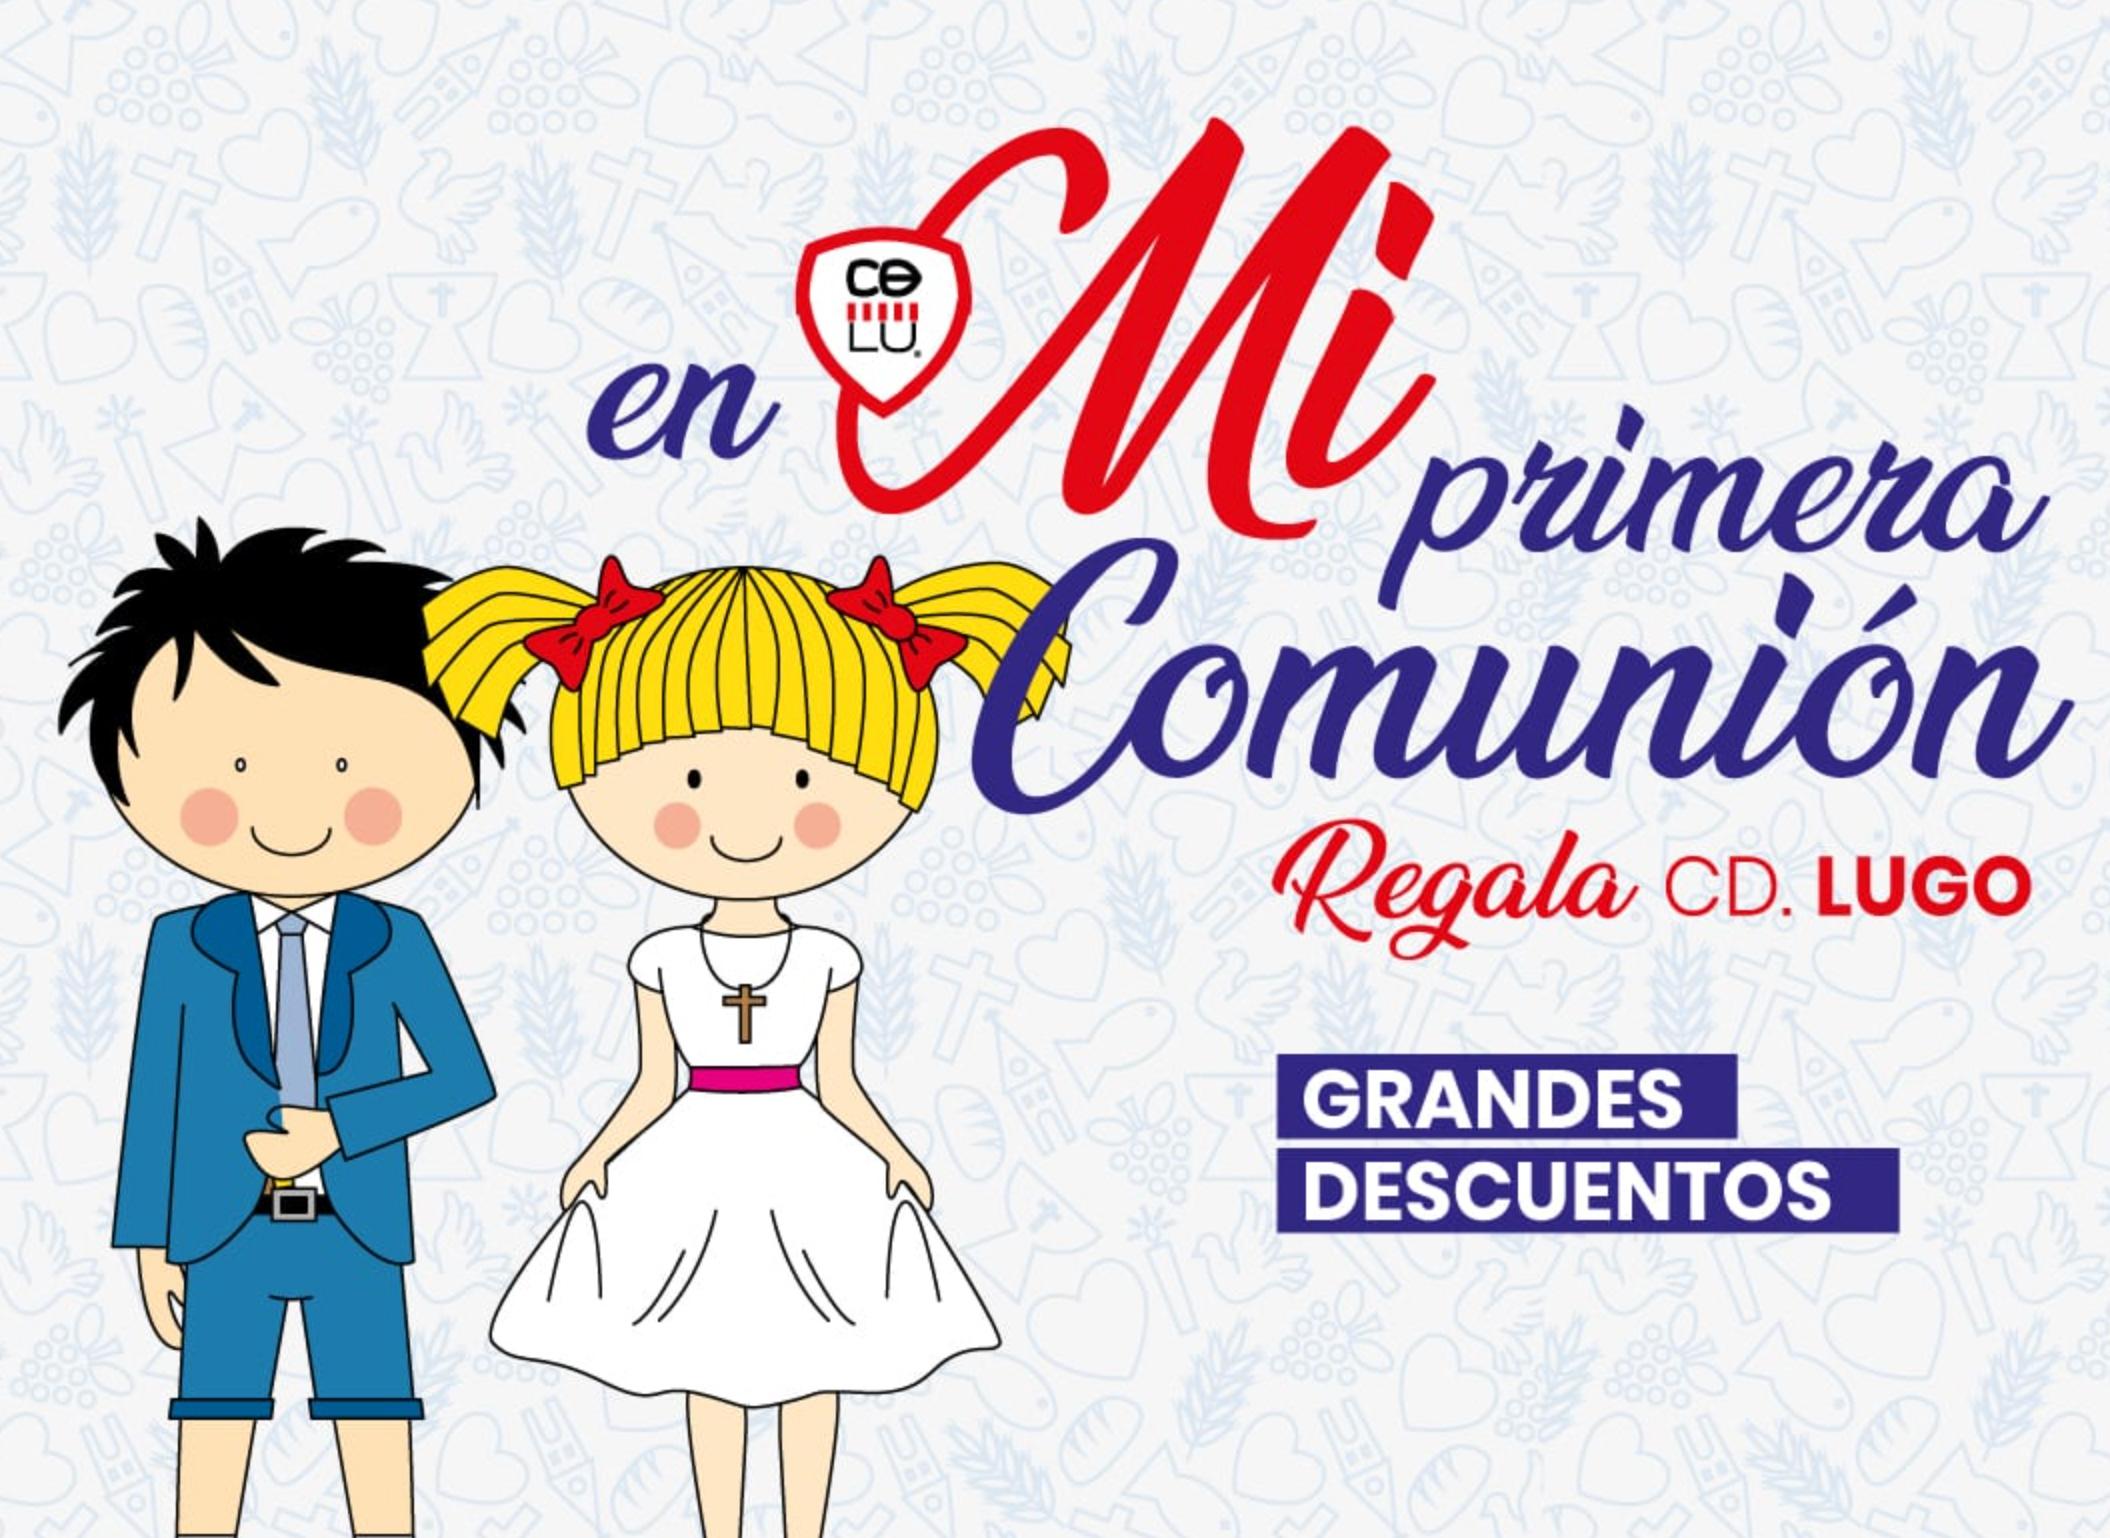 Promoción primera comunión